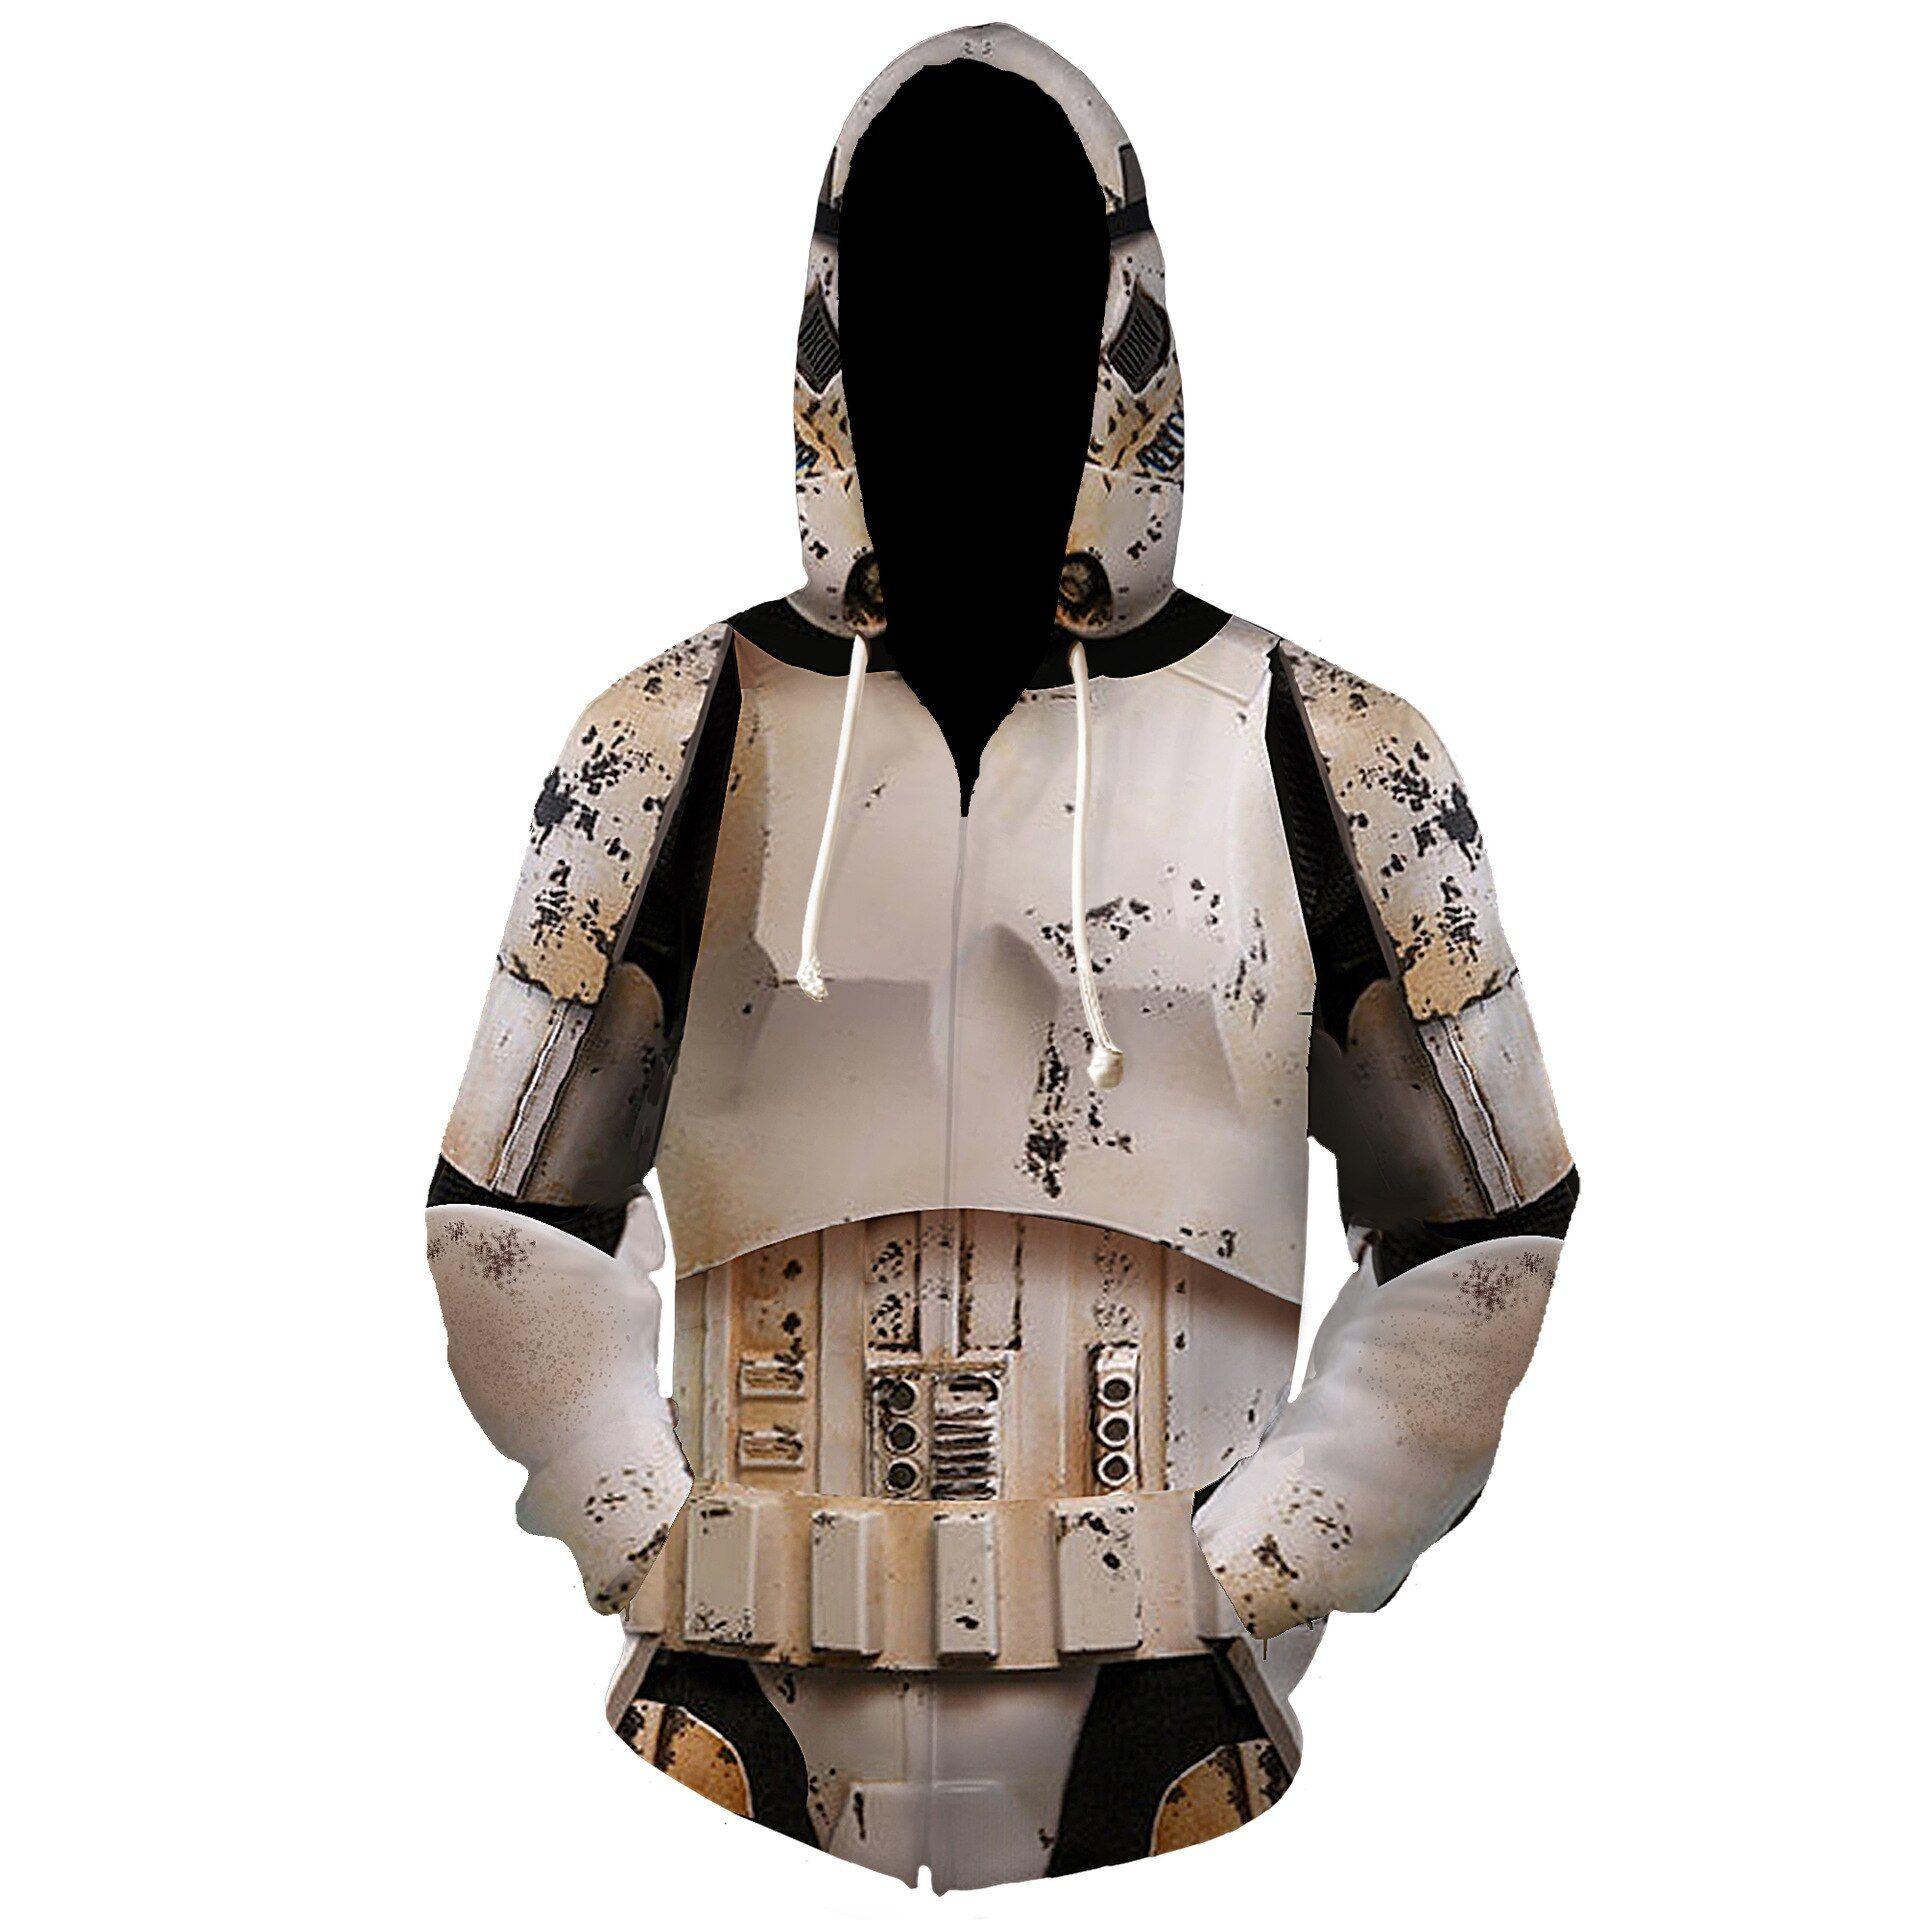 Película Star Wars The Rise of Skywalker Jedi sudaderas de caballero chaquetas de Cosplay trajes Mandalorian impresión 3D sudaderas con capucha